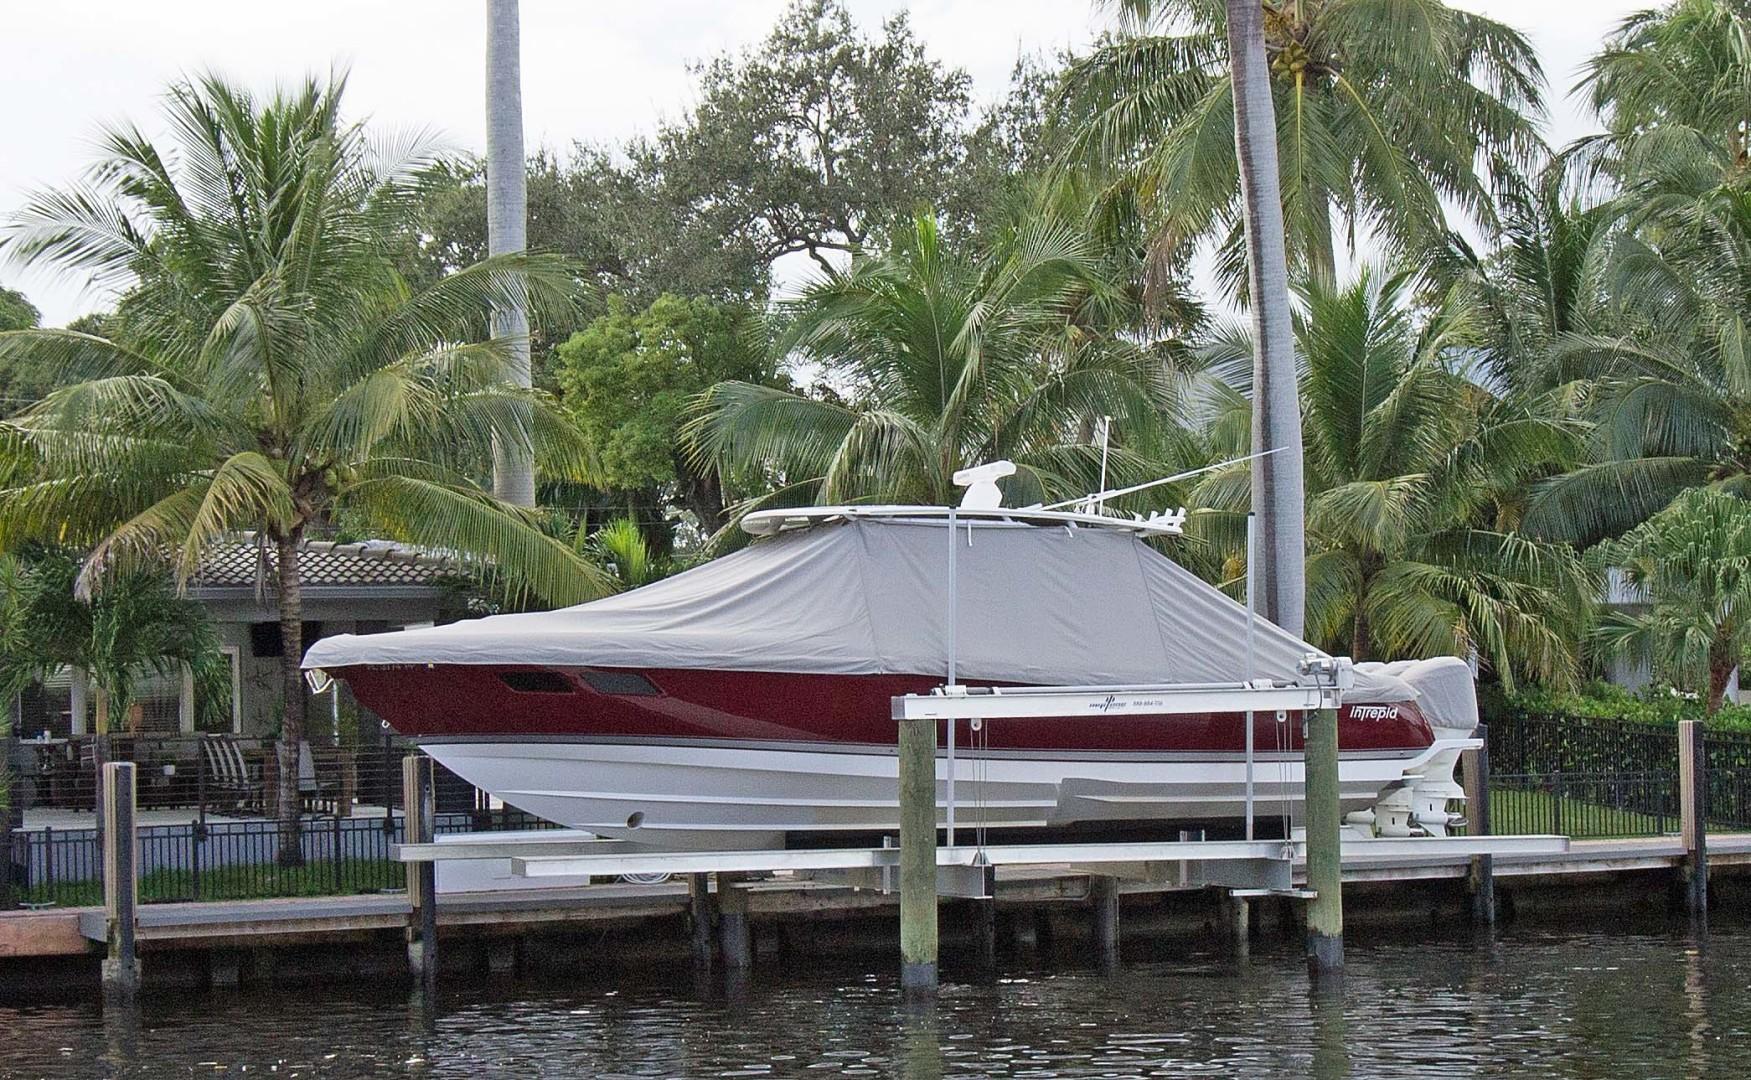 Intrepid-375 Walkaround 2014-NN 375 Walkaround 2014 Fort Lauderdale-Florida-United States-1507658 | Thumbnail